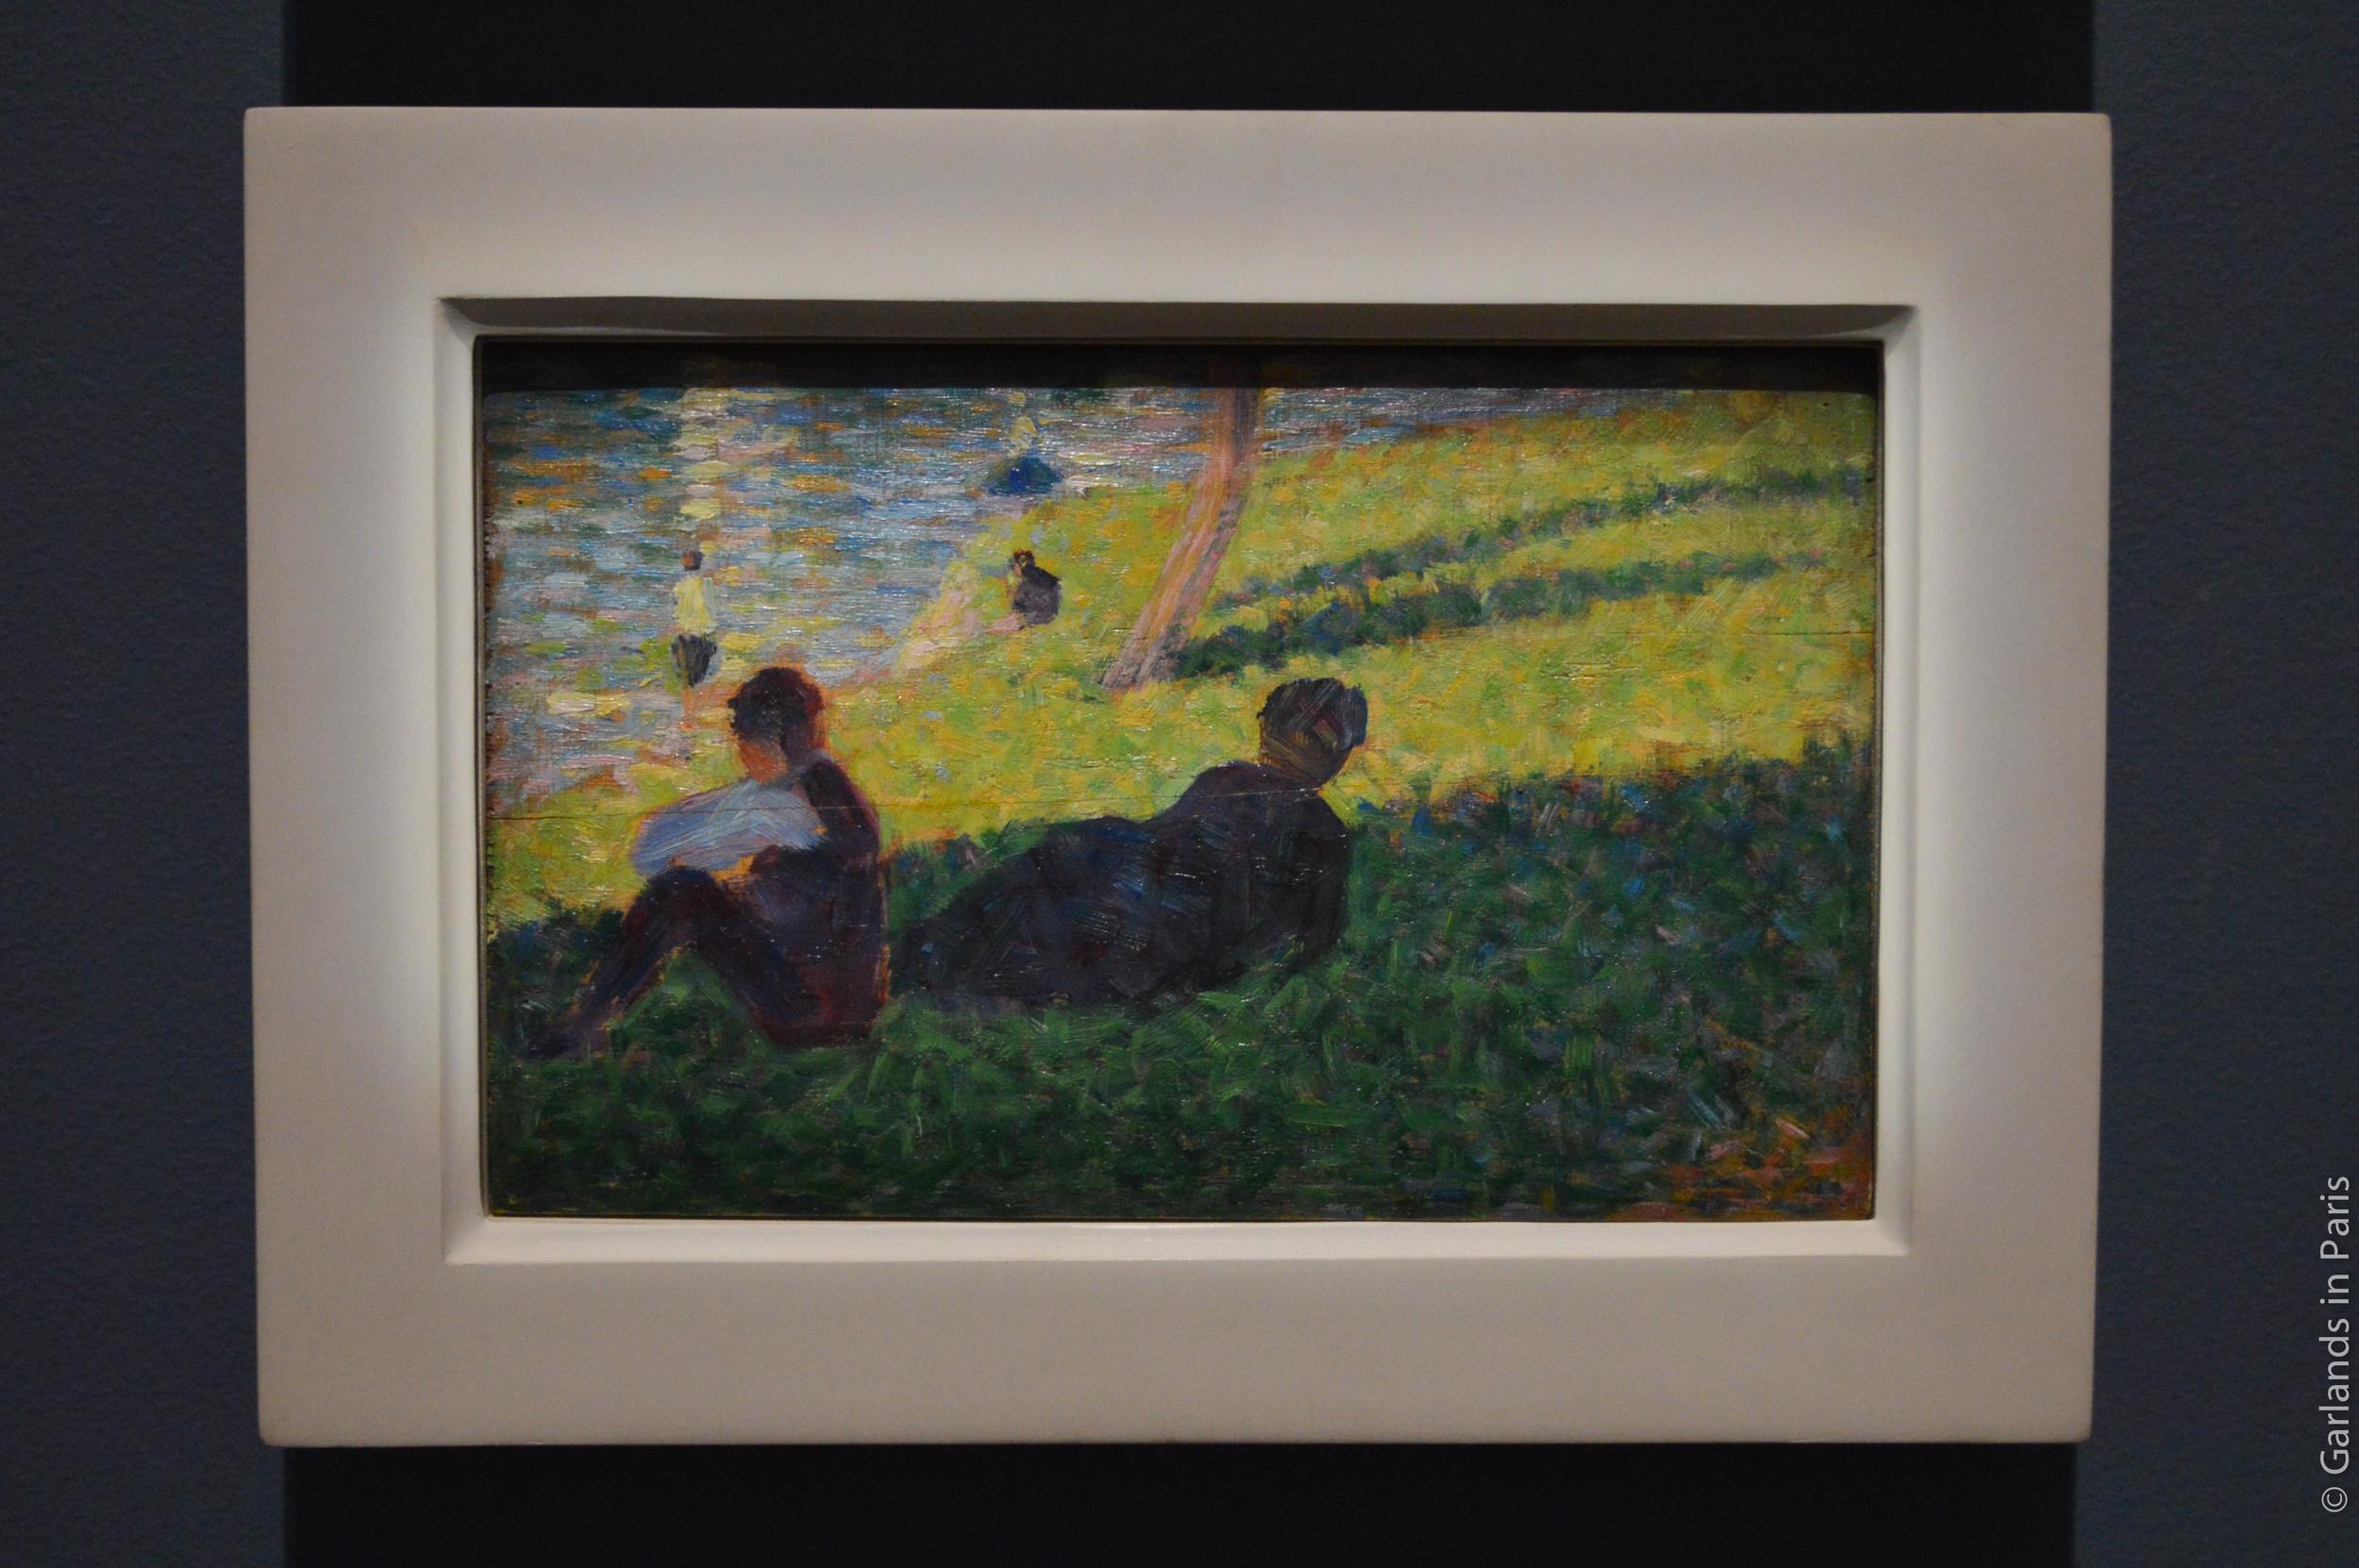 Green, painting, Orsay, Paris